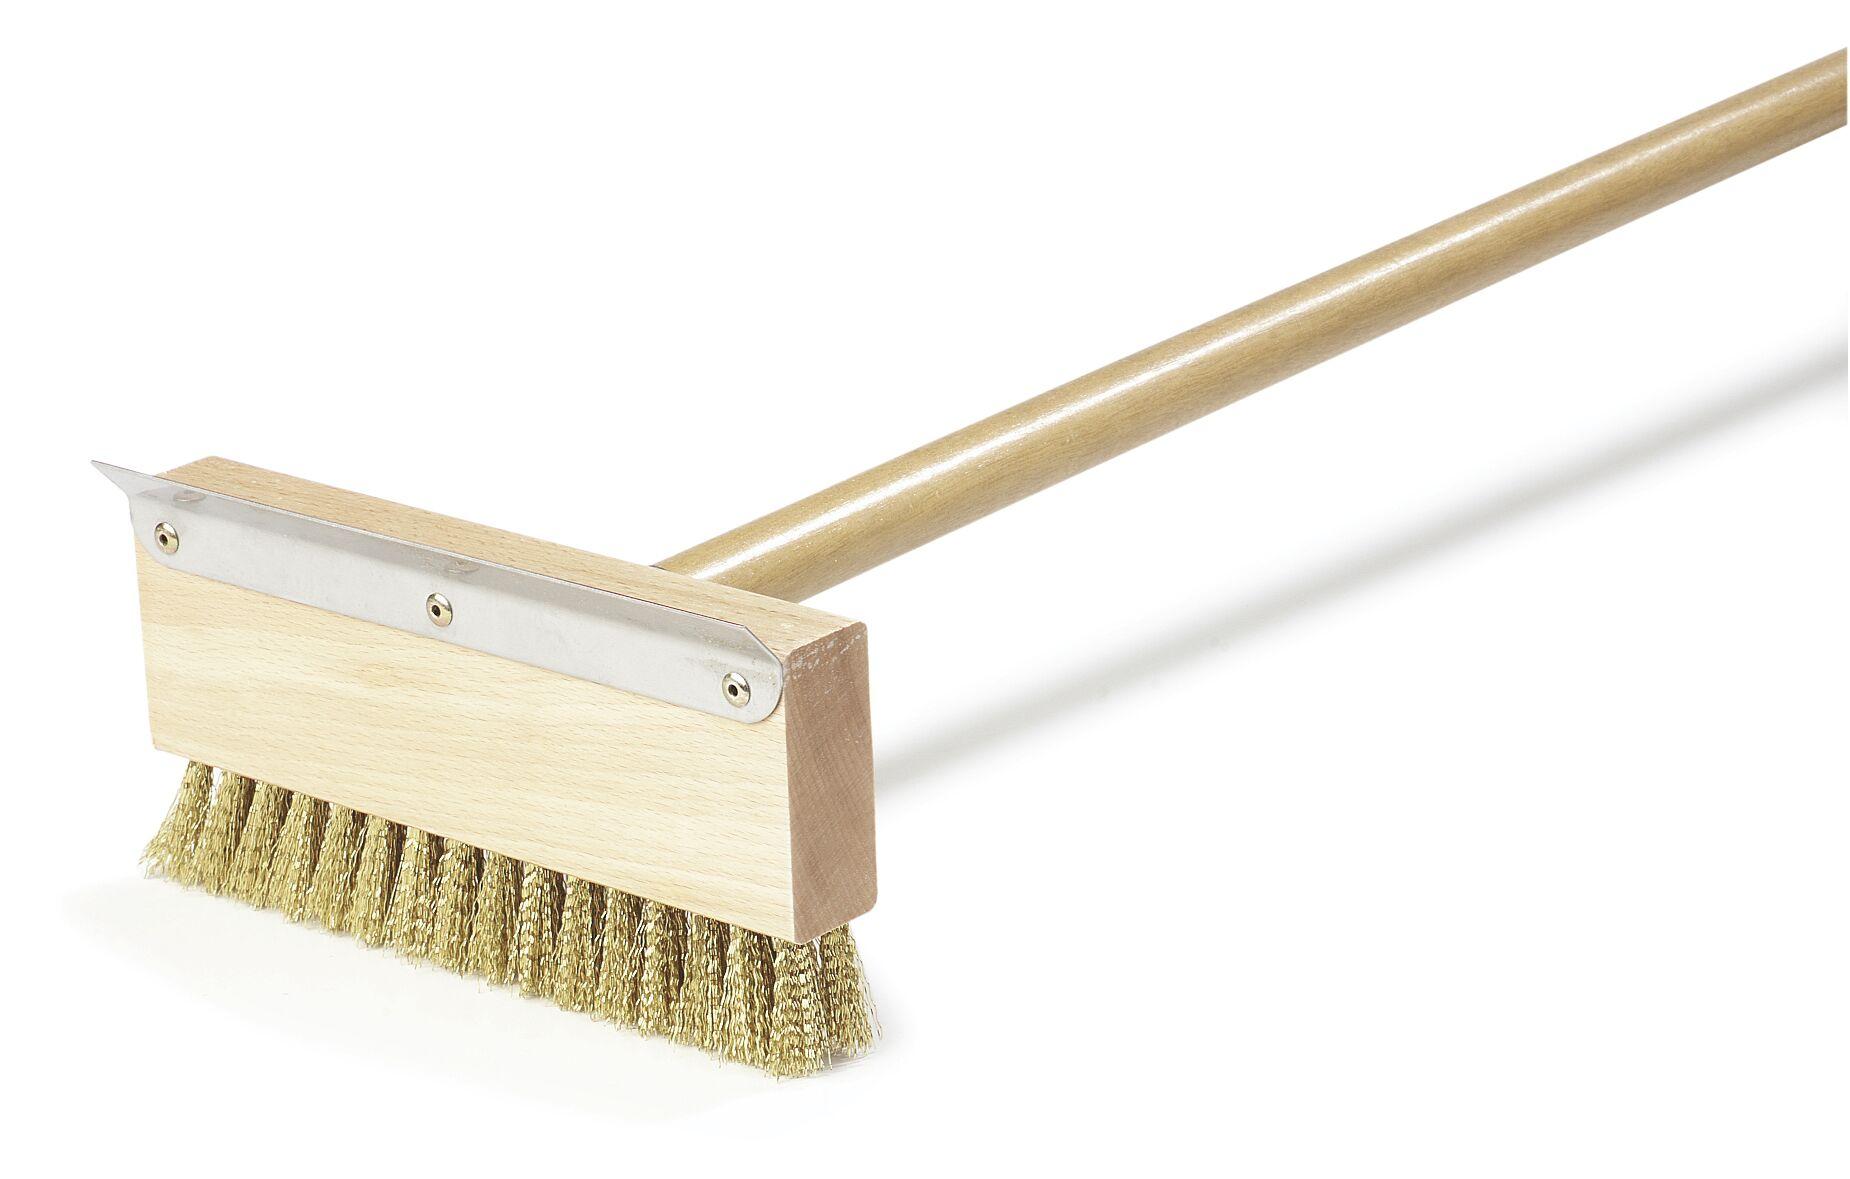 Oven Brush and Scraper with Brass Bristles